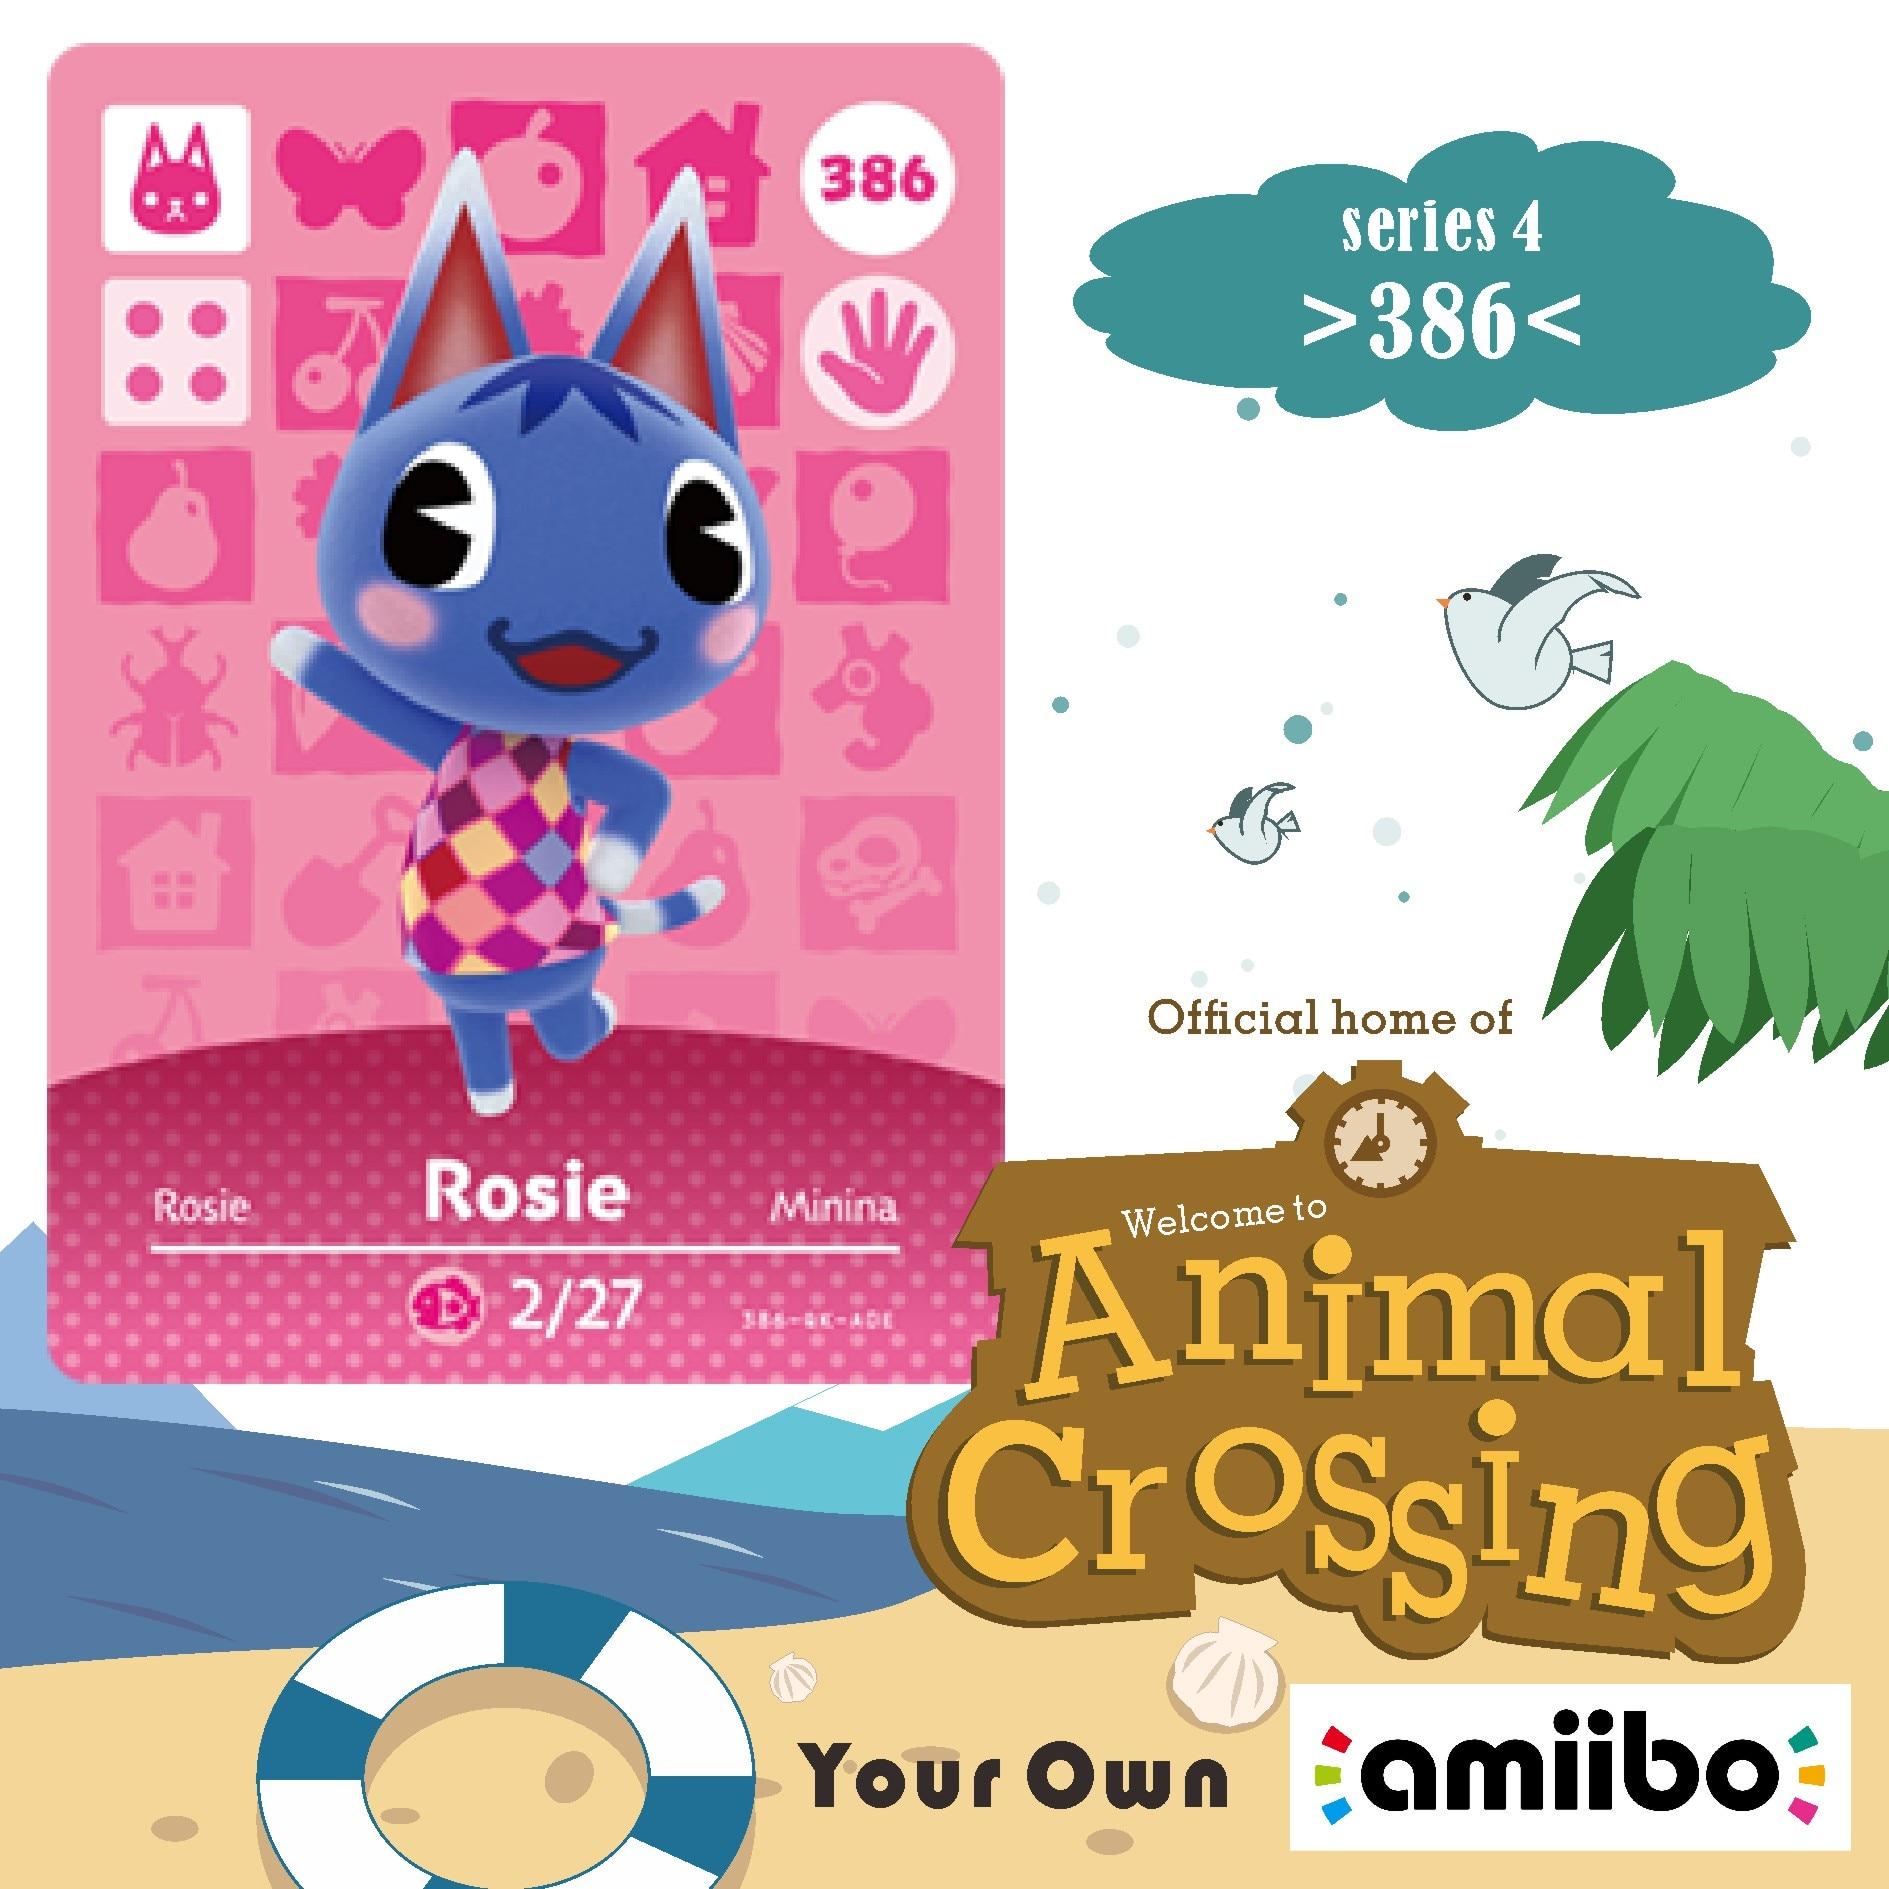 Minina Tarjeta 386 Amiibo, tarjetas de Rosa Amiibo, animales que cruzan a los animales, serie Amiibo Cross Card, 1 Villager 386